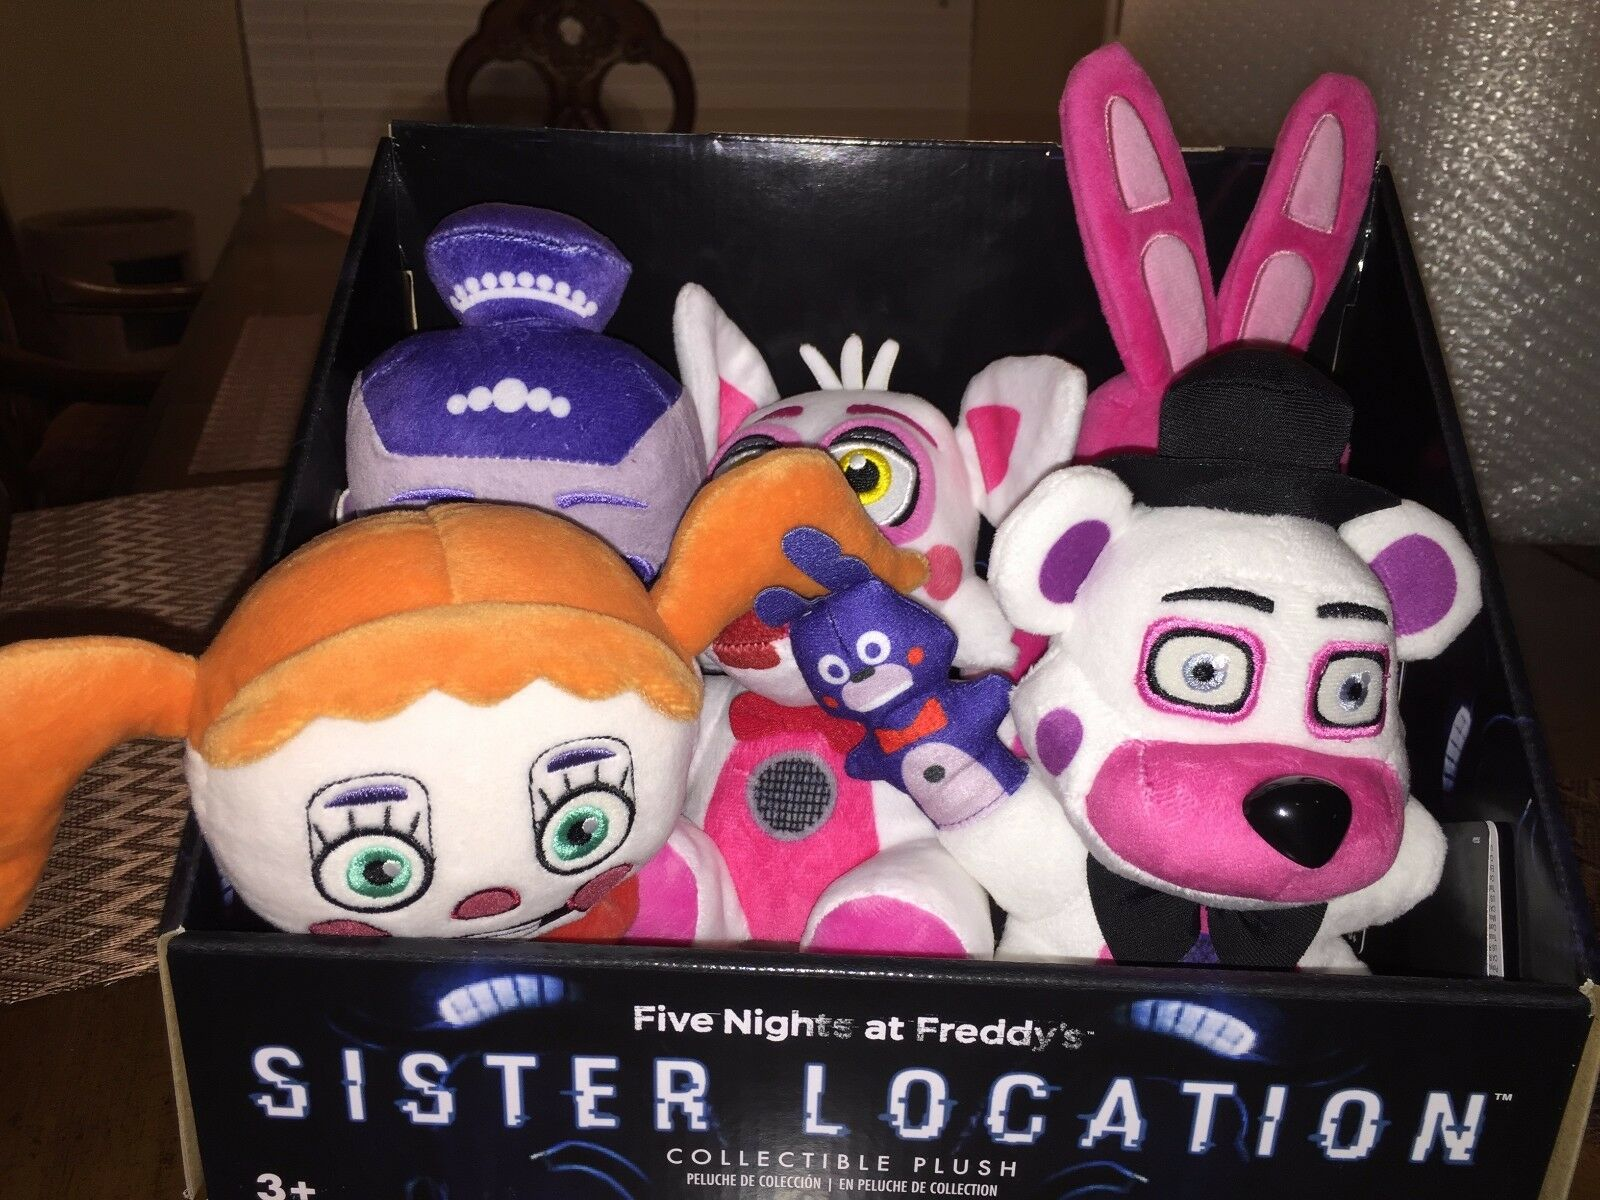 NWT FIVE NIGHTS AT FREDDY'S SISTER LOCATION PLUSH & DISPLAY BOX BONNET FREDDY